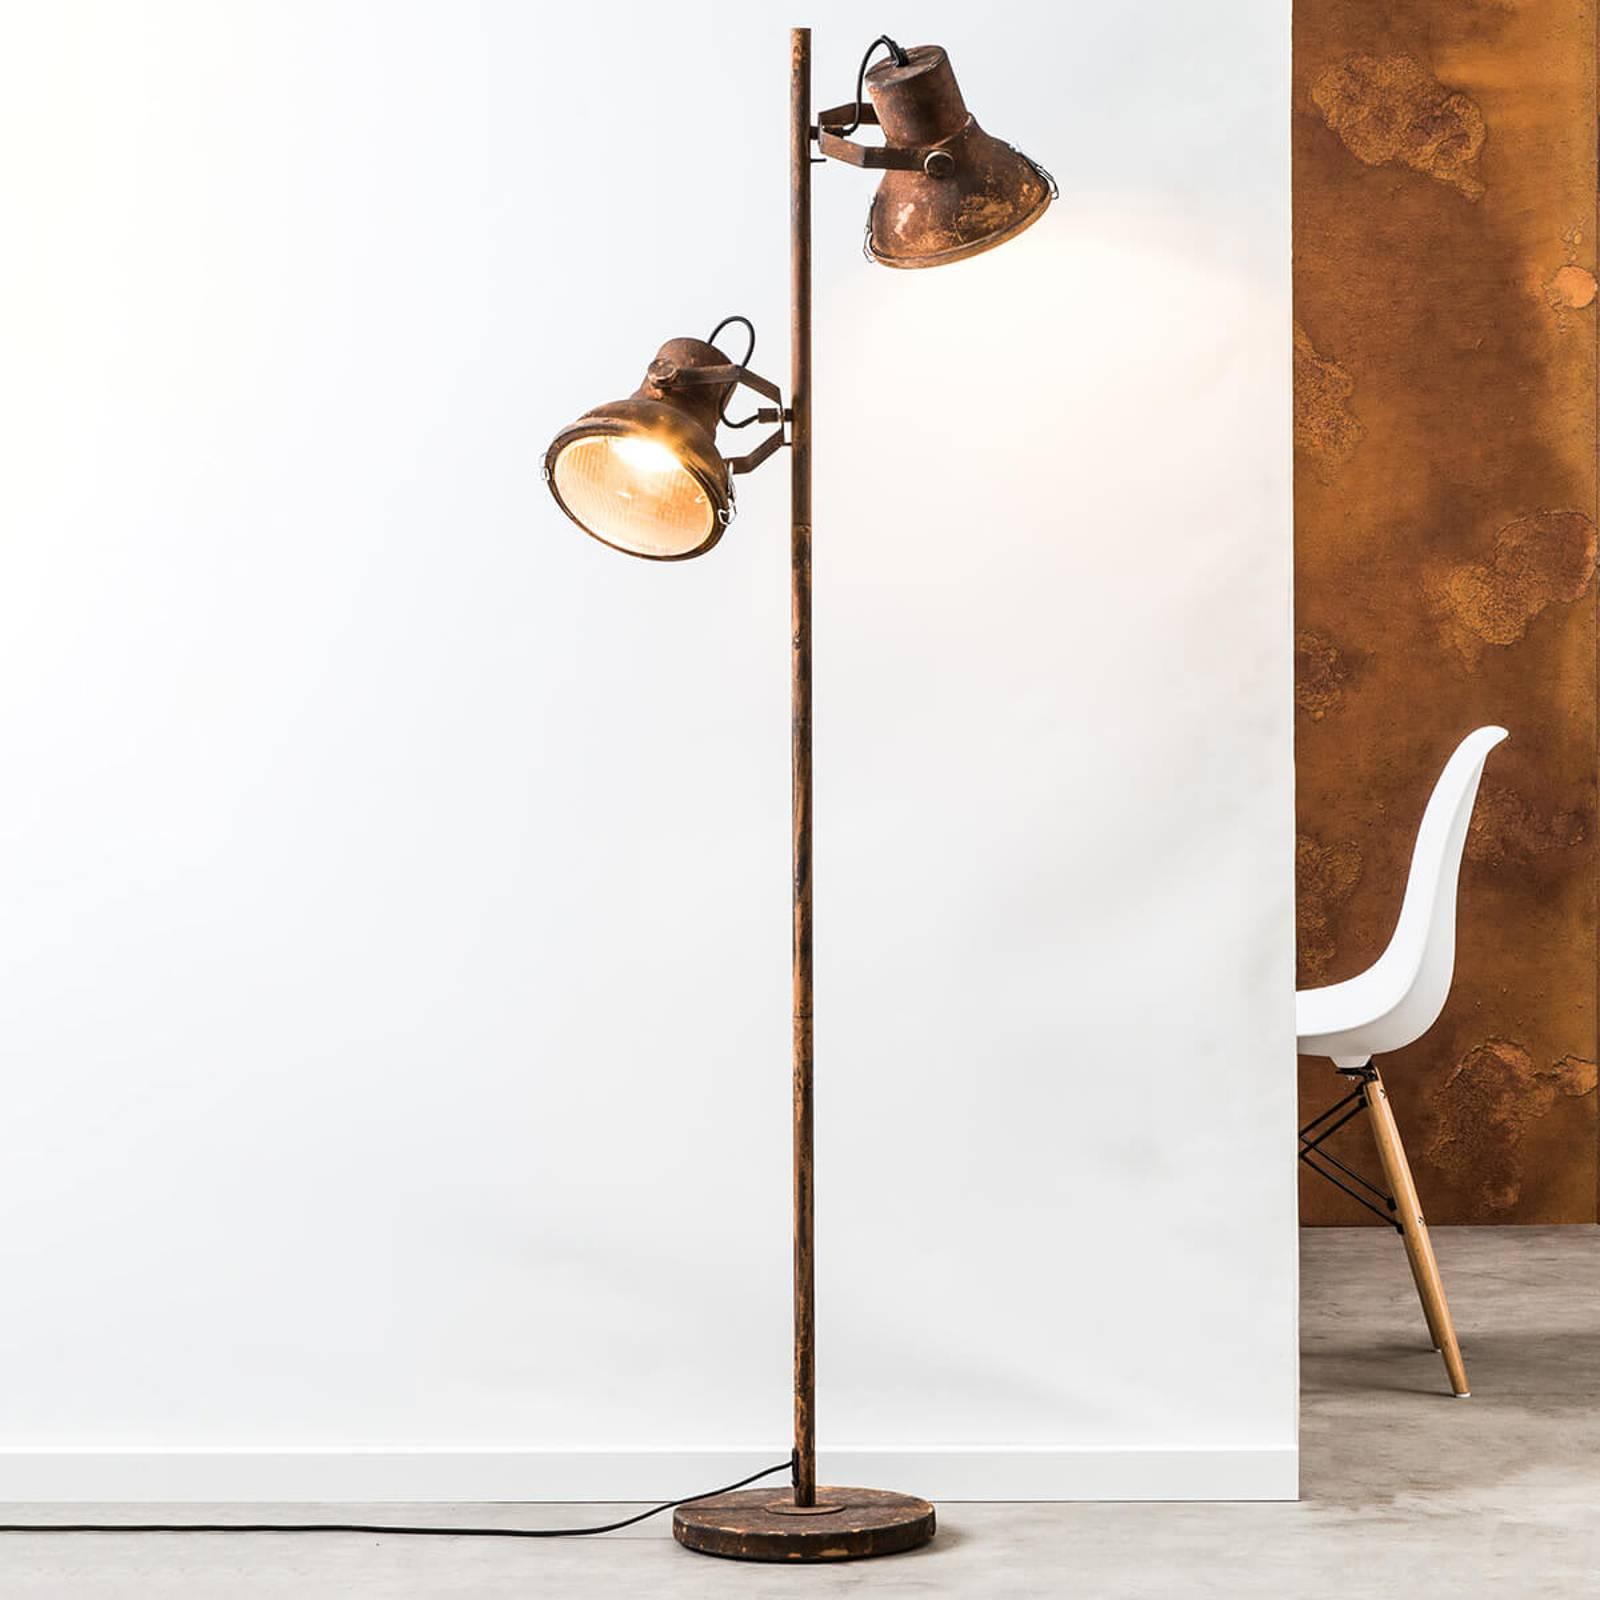 Vloerlamp Frodo met twee lampjes